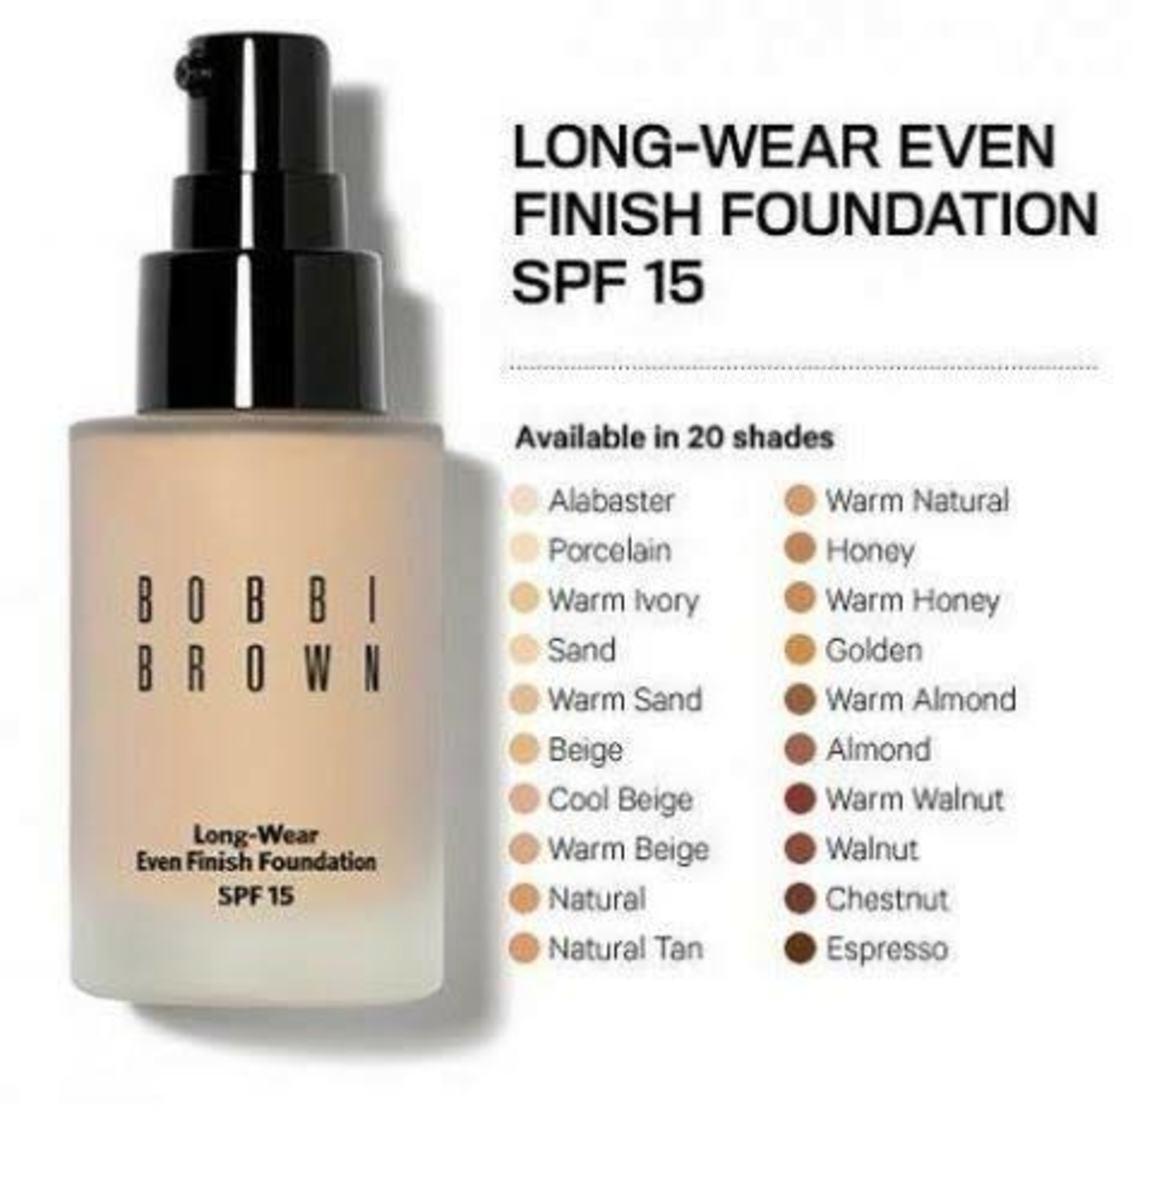 bobbi-brown-foundation-review